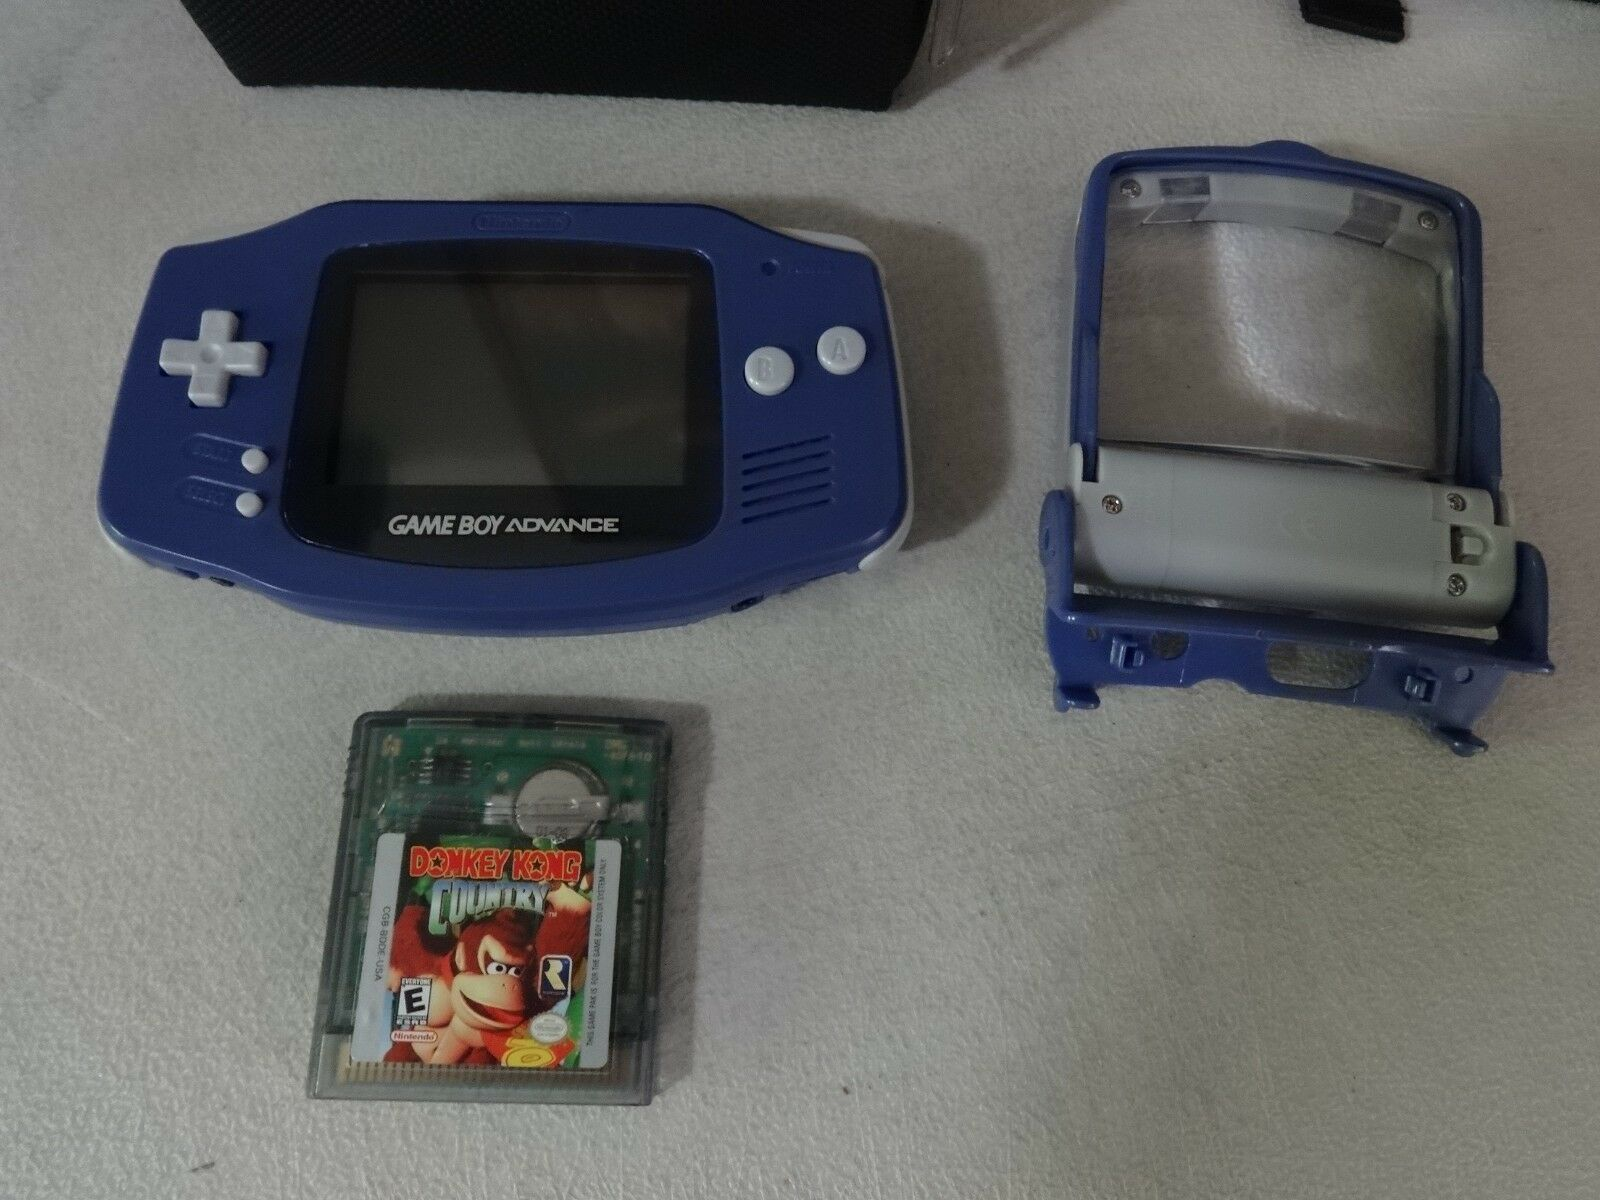 FULLY TESTED Nintendo Game Boy Advance - Original - Blue Model AGB-001 + Extras